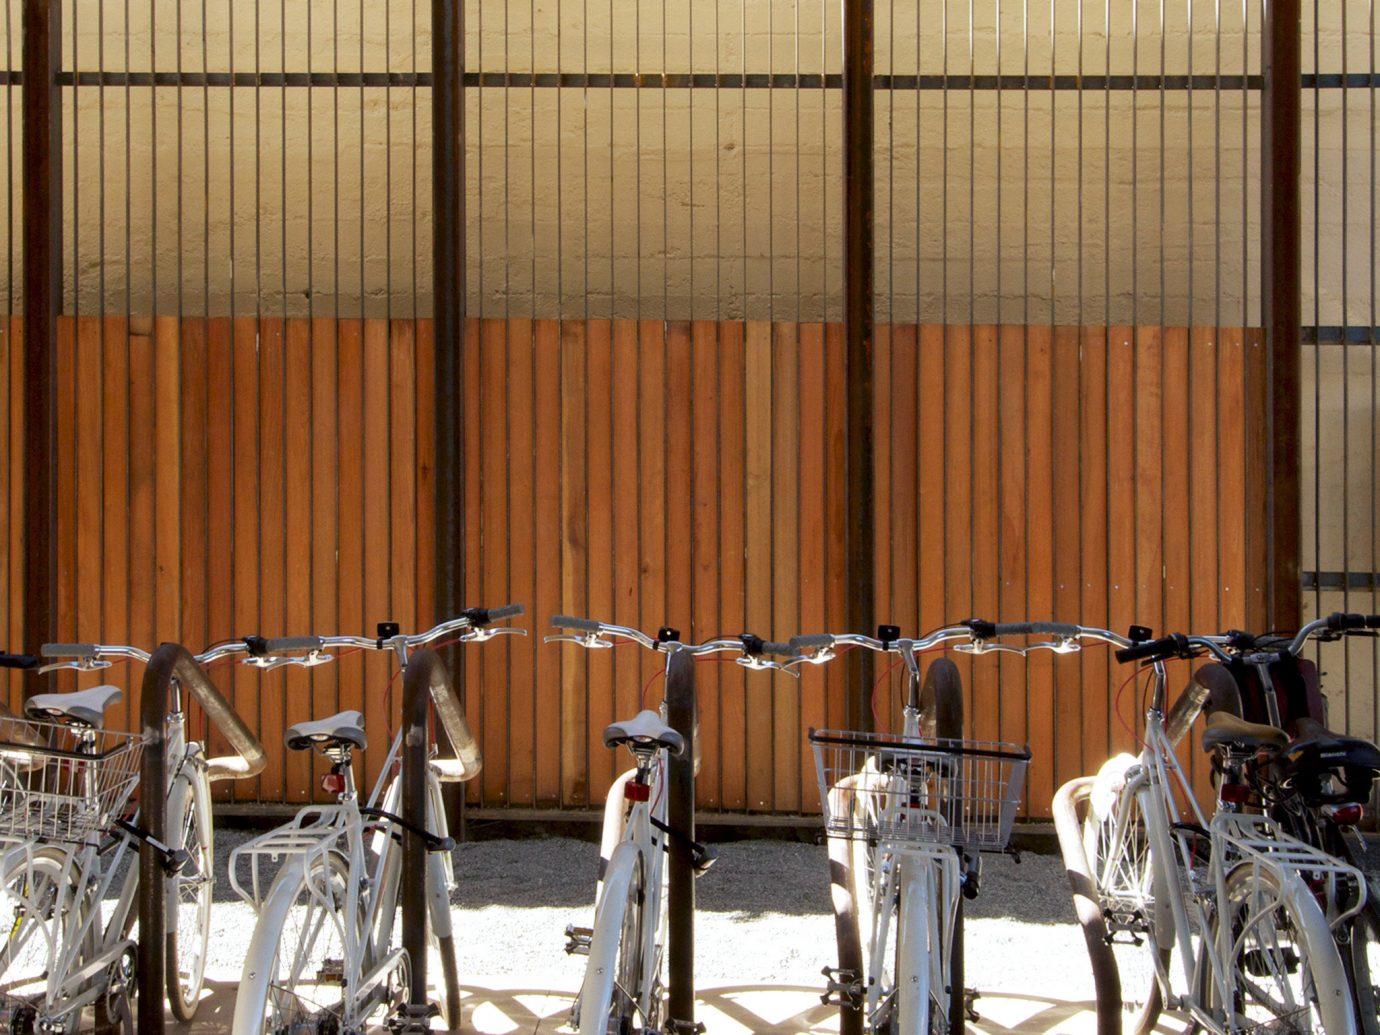 Fitness Health + Wellness Hip Hotels Modern Sport Wellness Yoga Retreats bicycle vehicle interior design cart pulling